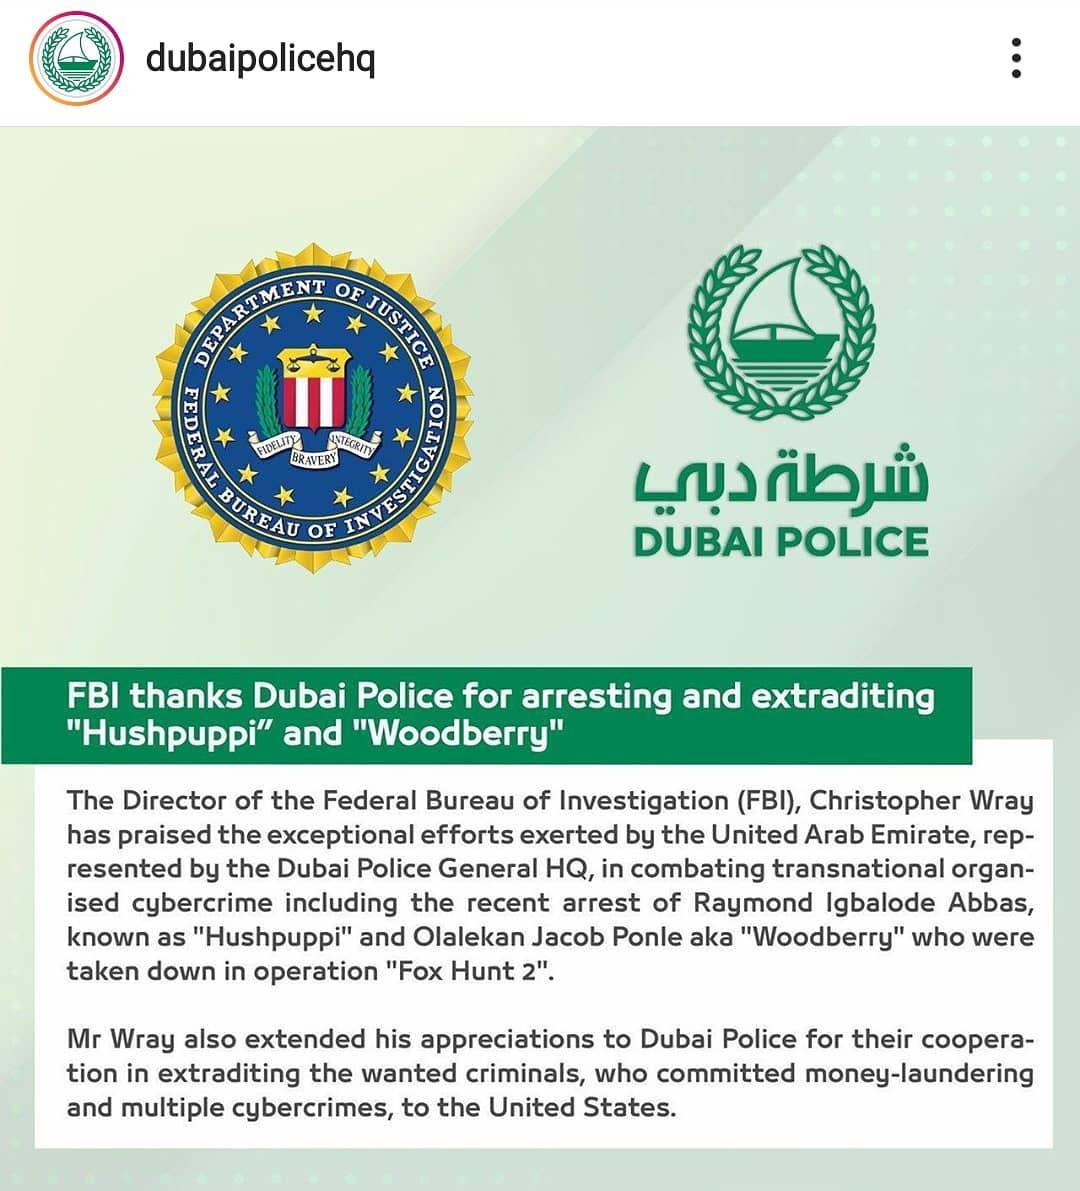 Image screenshot of dubaipolice instagram post